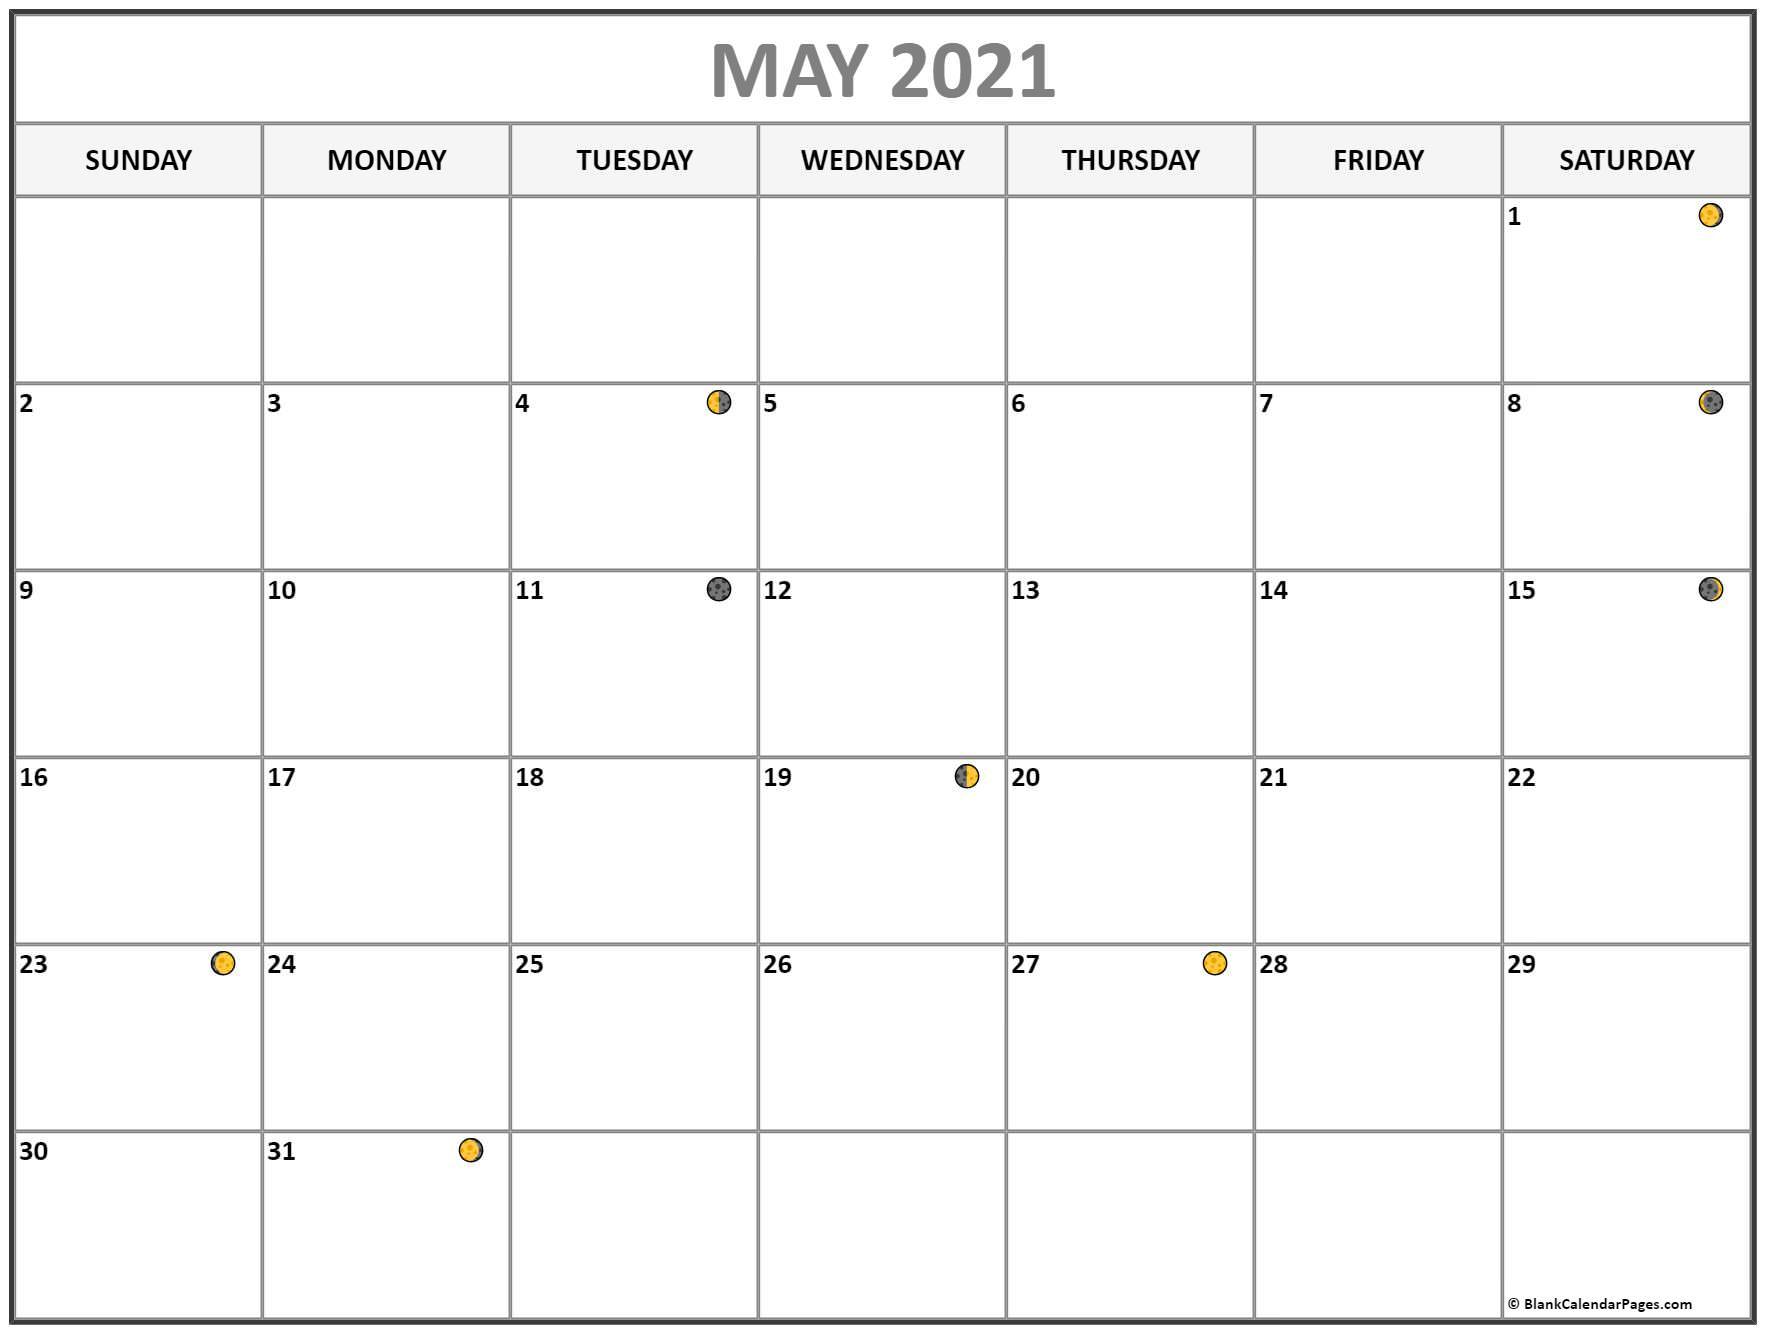 May 2021 Lunar Calendar | Moon Phase Calendar throughout Full Moon Calendar 2021 Printable